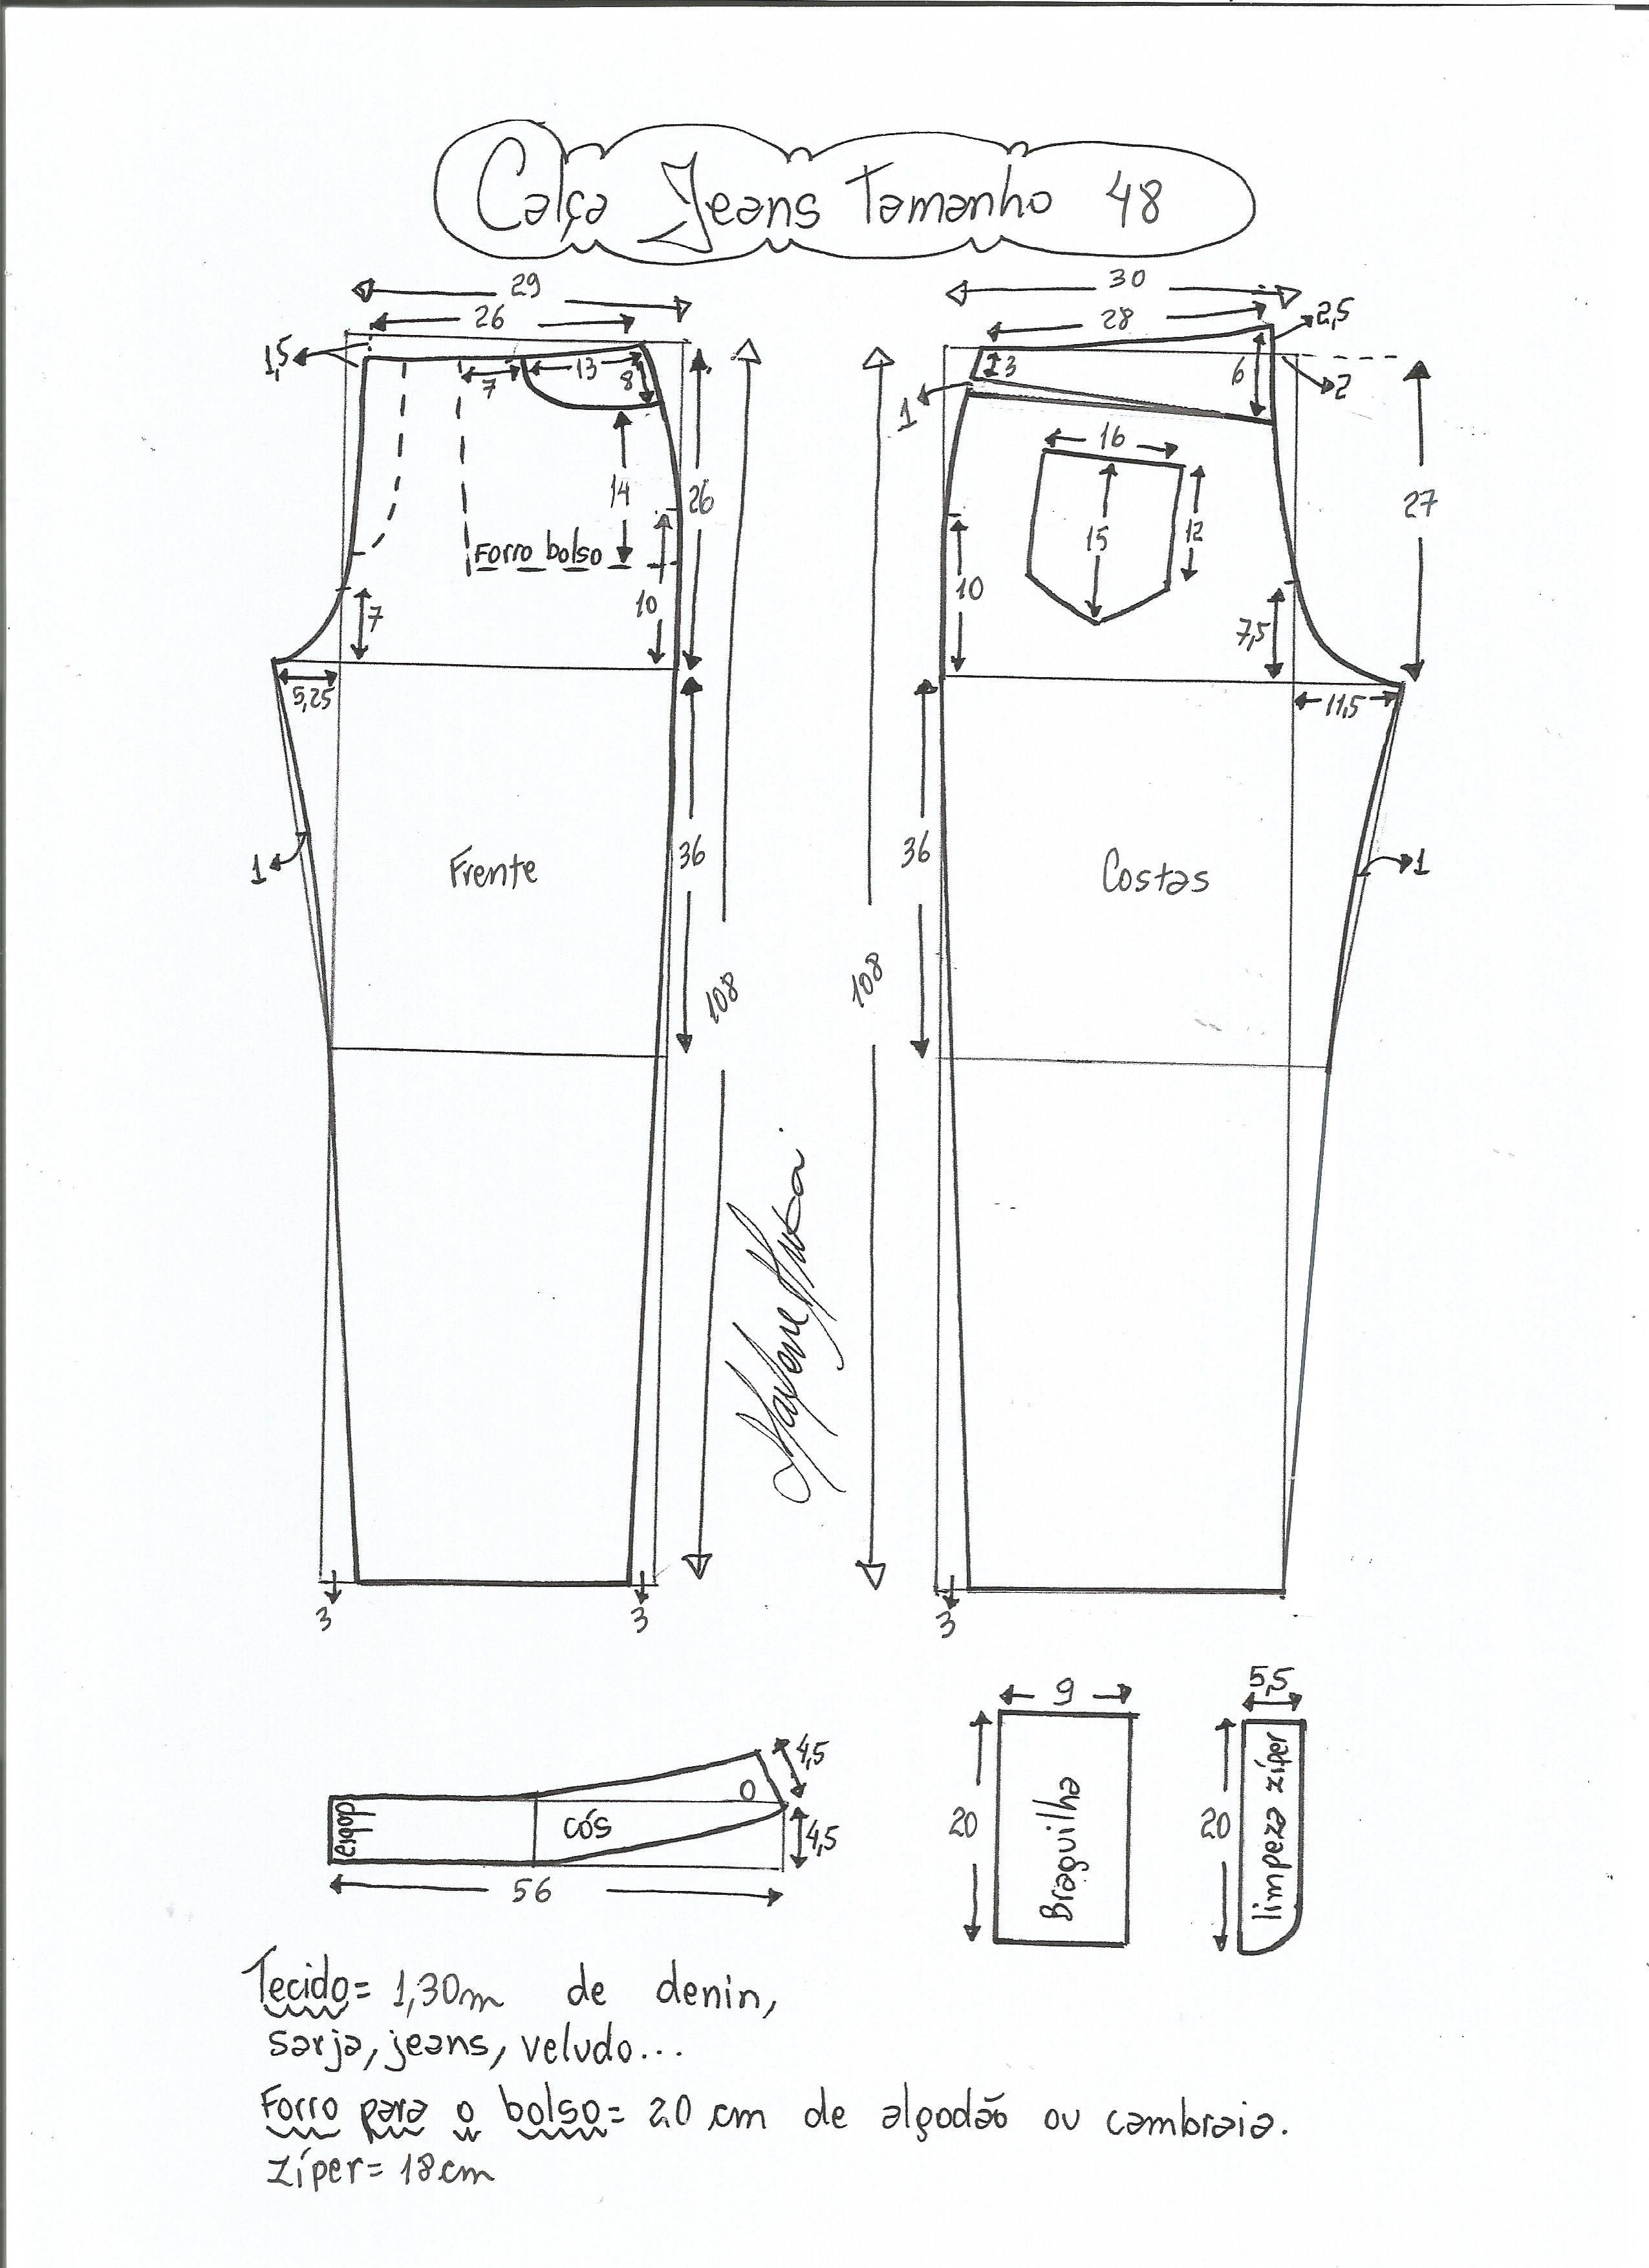 Calça jeans cós médio | Costura, Molde y Patrones